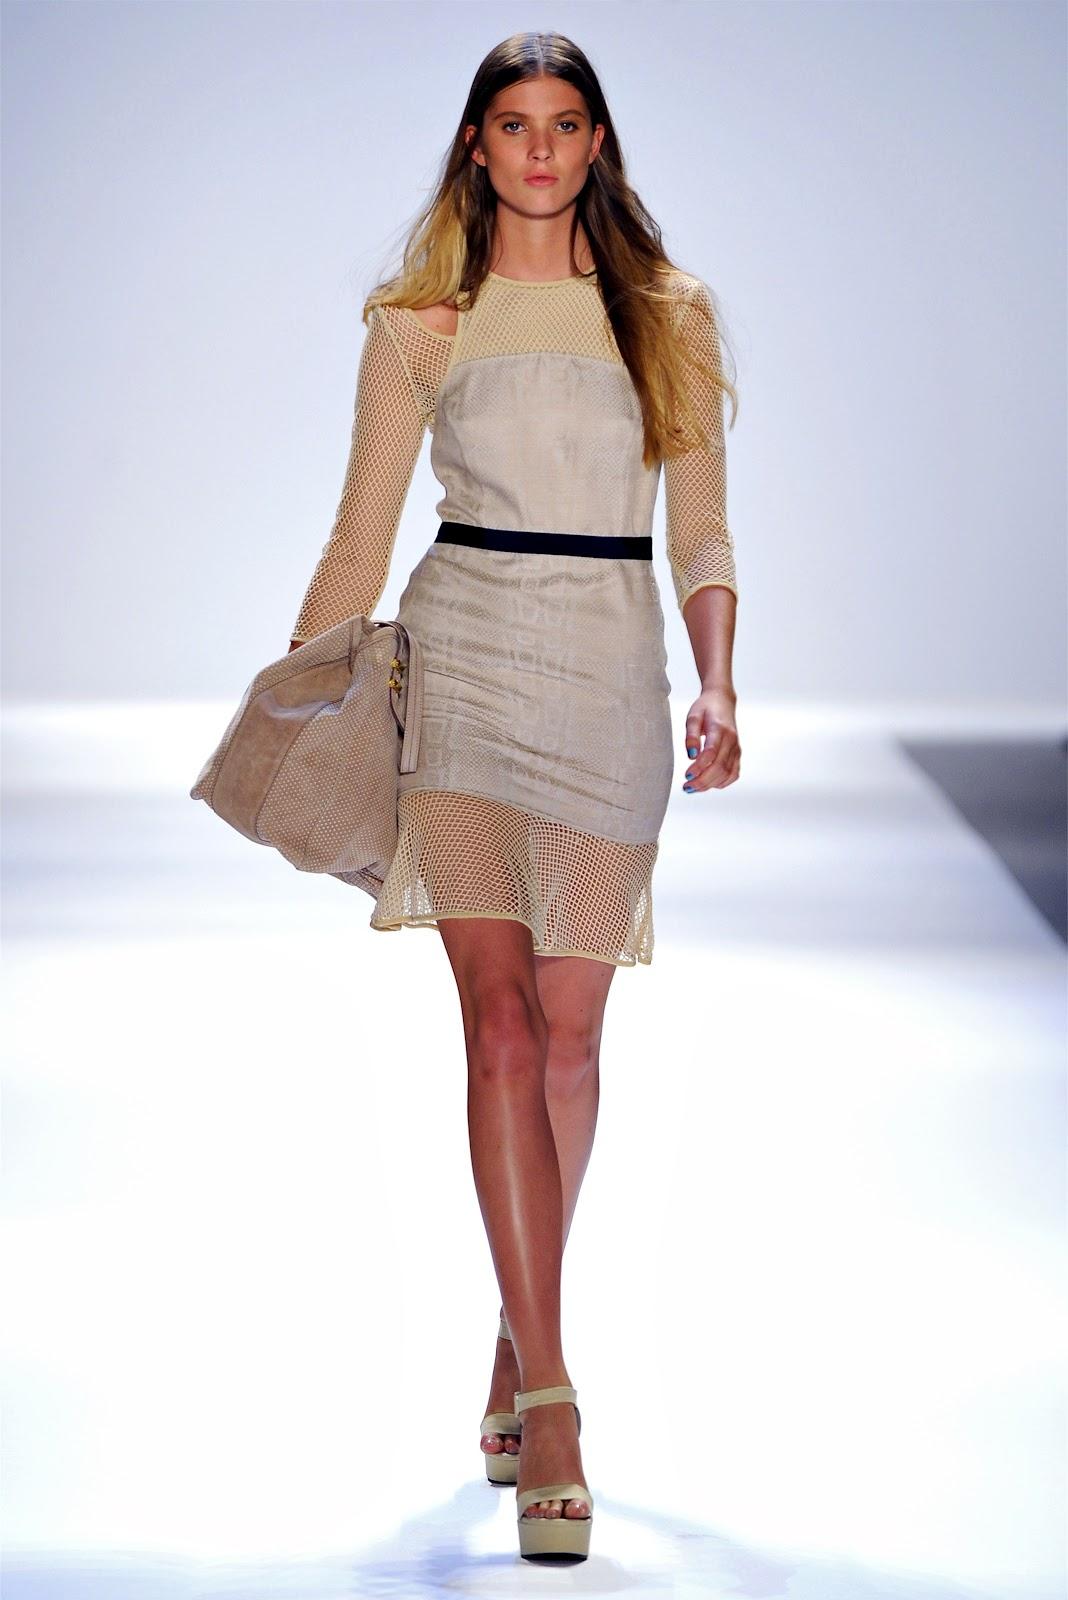 http://2.bp.blogspot.com/-ZyVGuteyZmg/UGC08PPHfEI/AAAAAAAAF7o/i99FaEZLvRw/s1600/charlotte-ronson_001.jpg